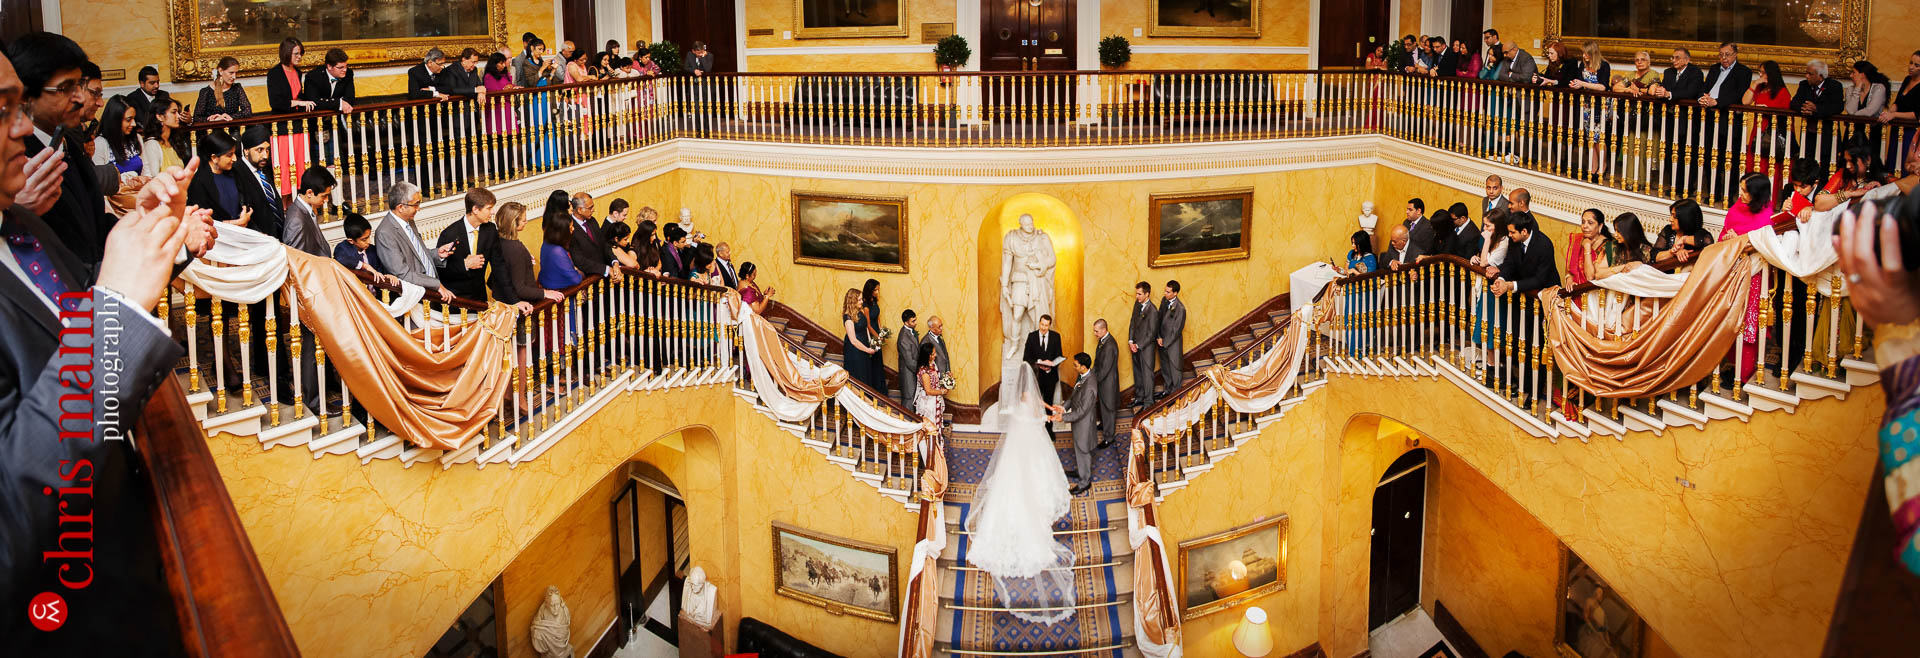 London-Hindu-wedding-IOD-Pall-Mall-049